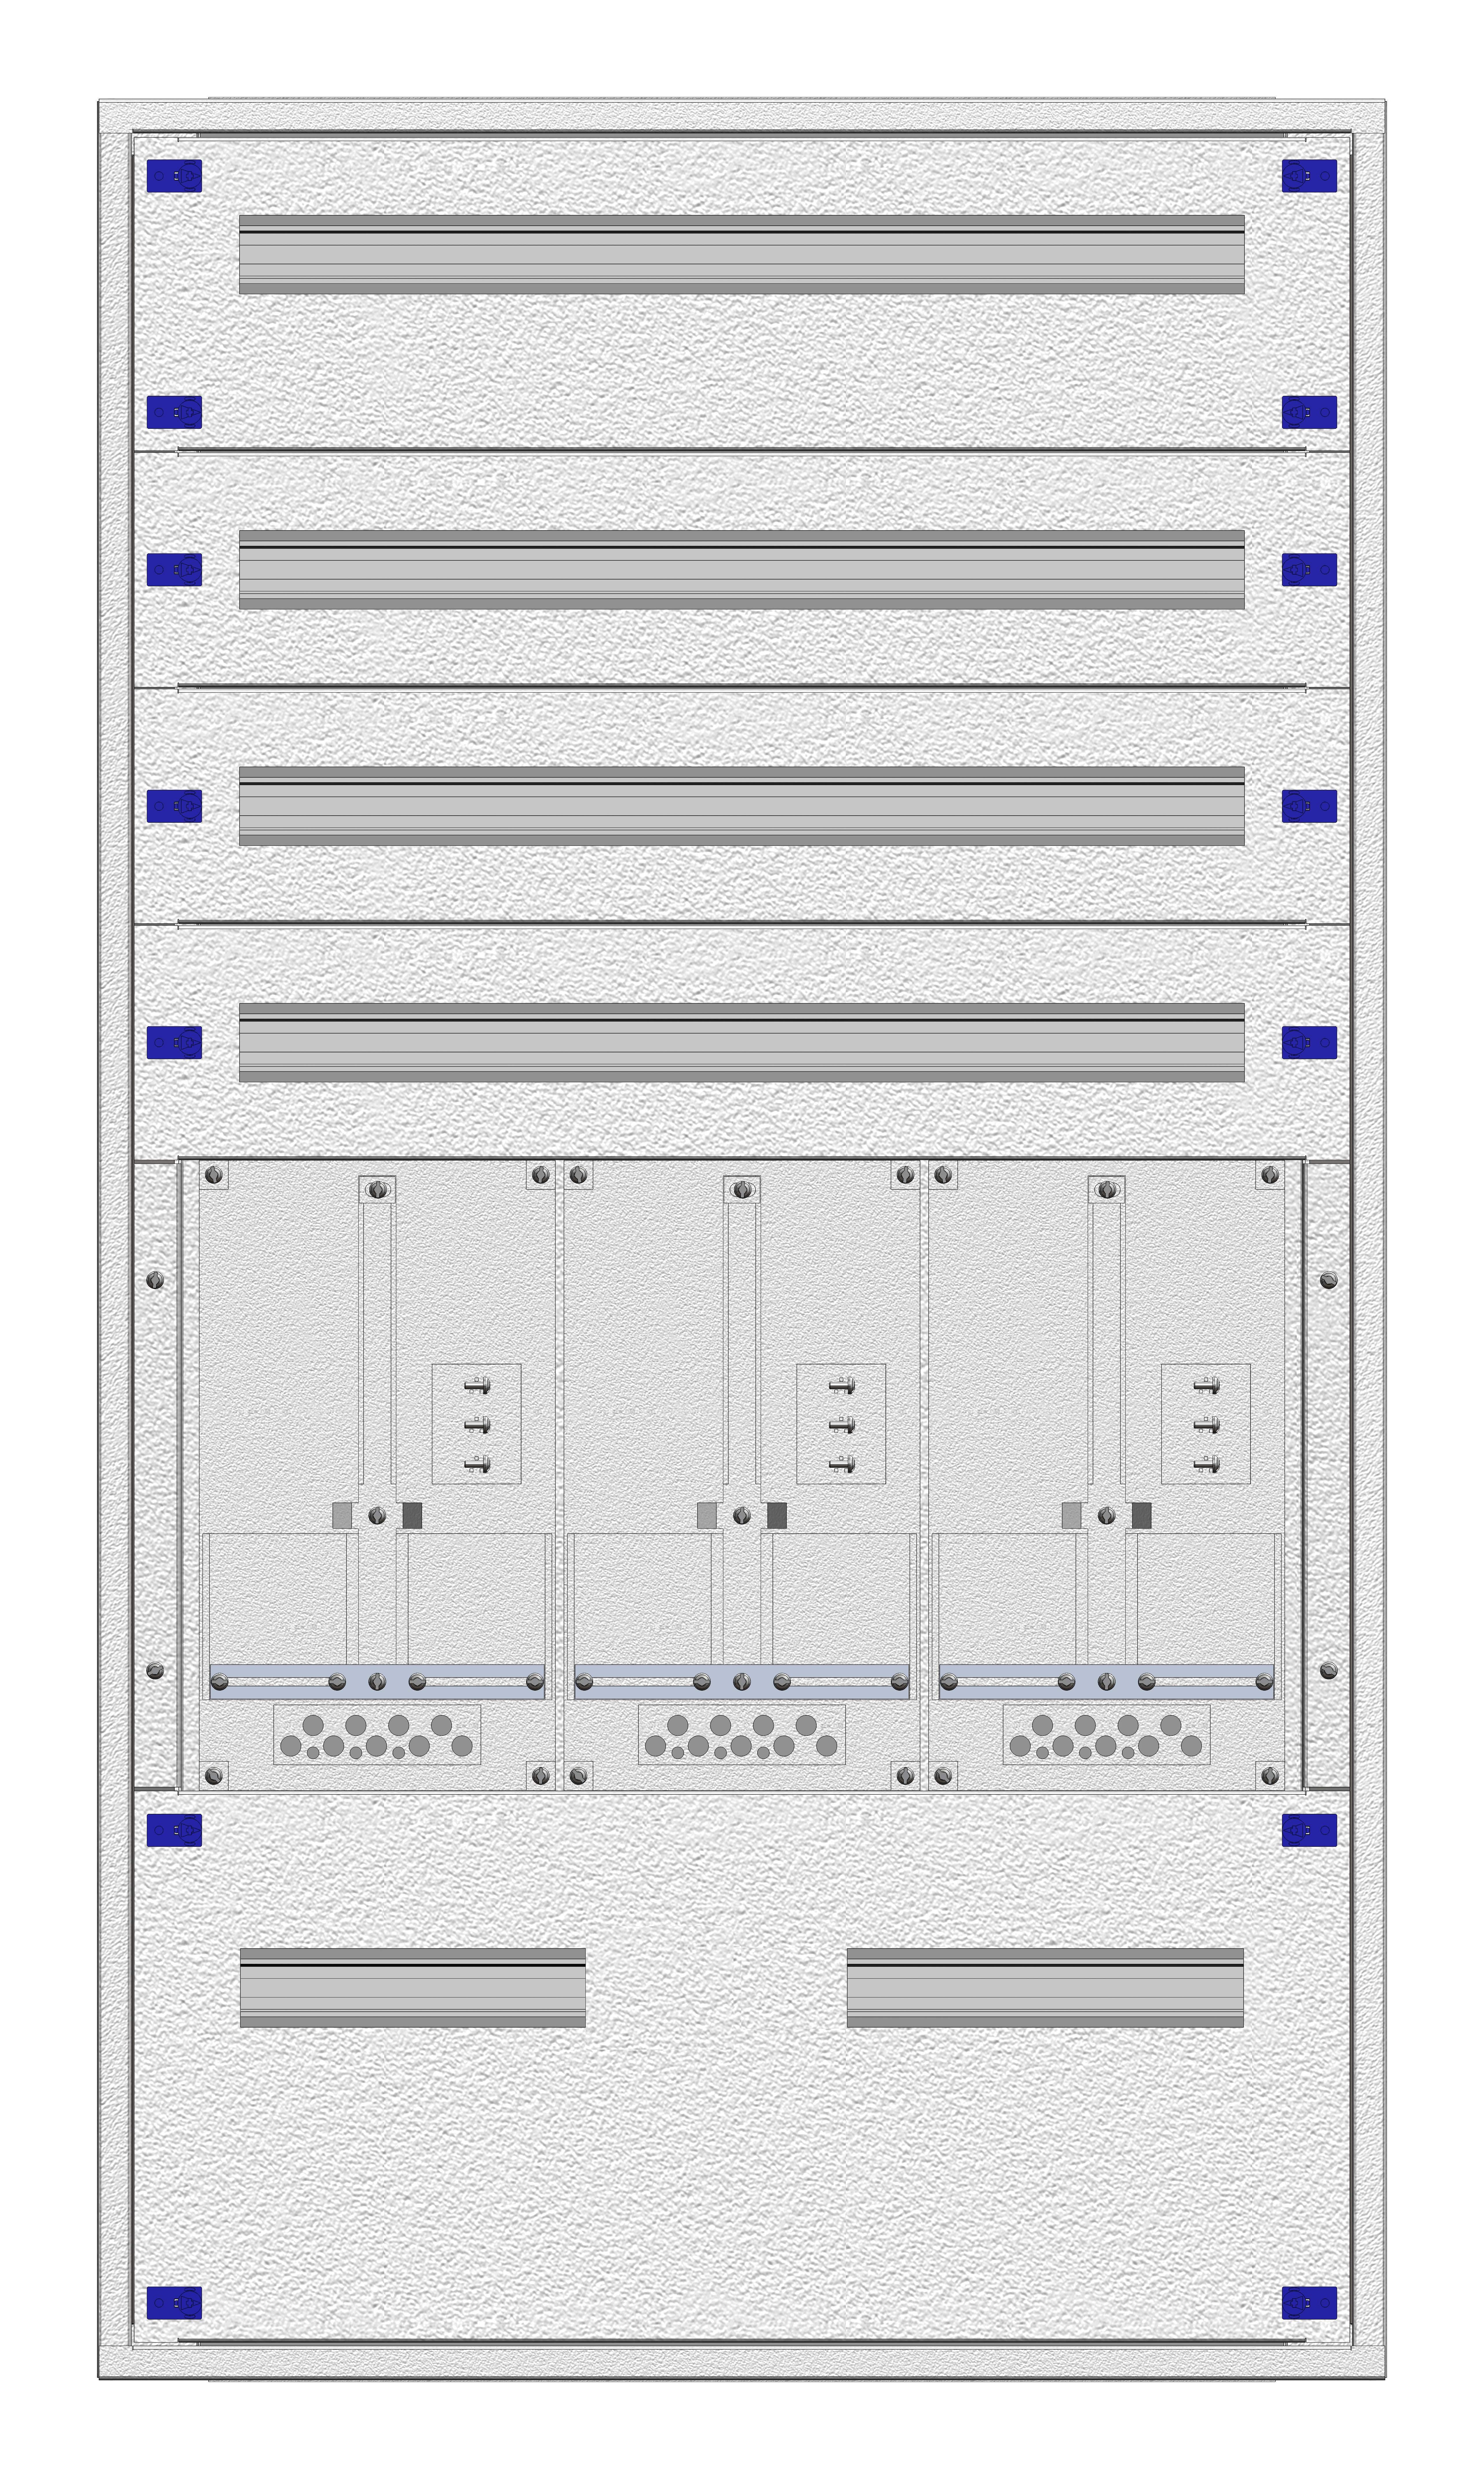 1 Stk Eco-AP-Verteiler 3A28 + Rückwand OÖ/SBG– RAL7035 IL865328--